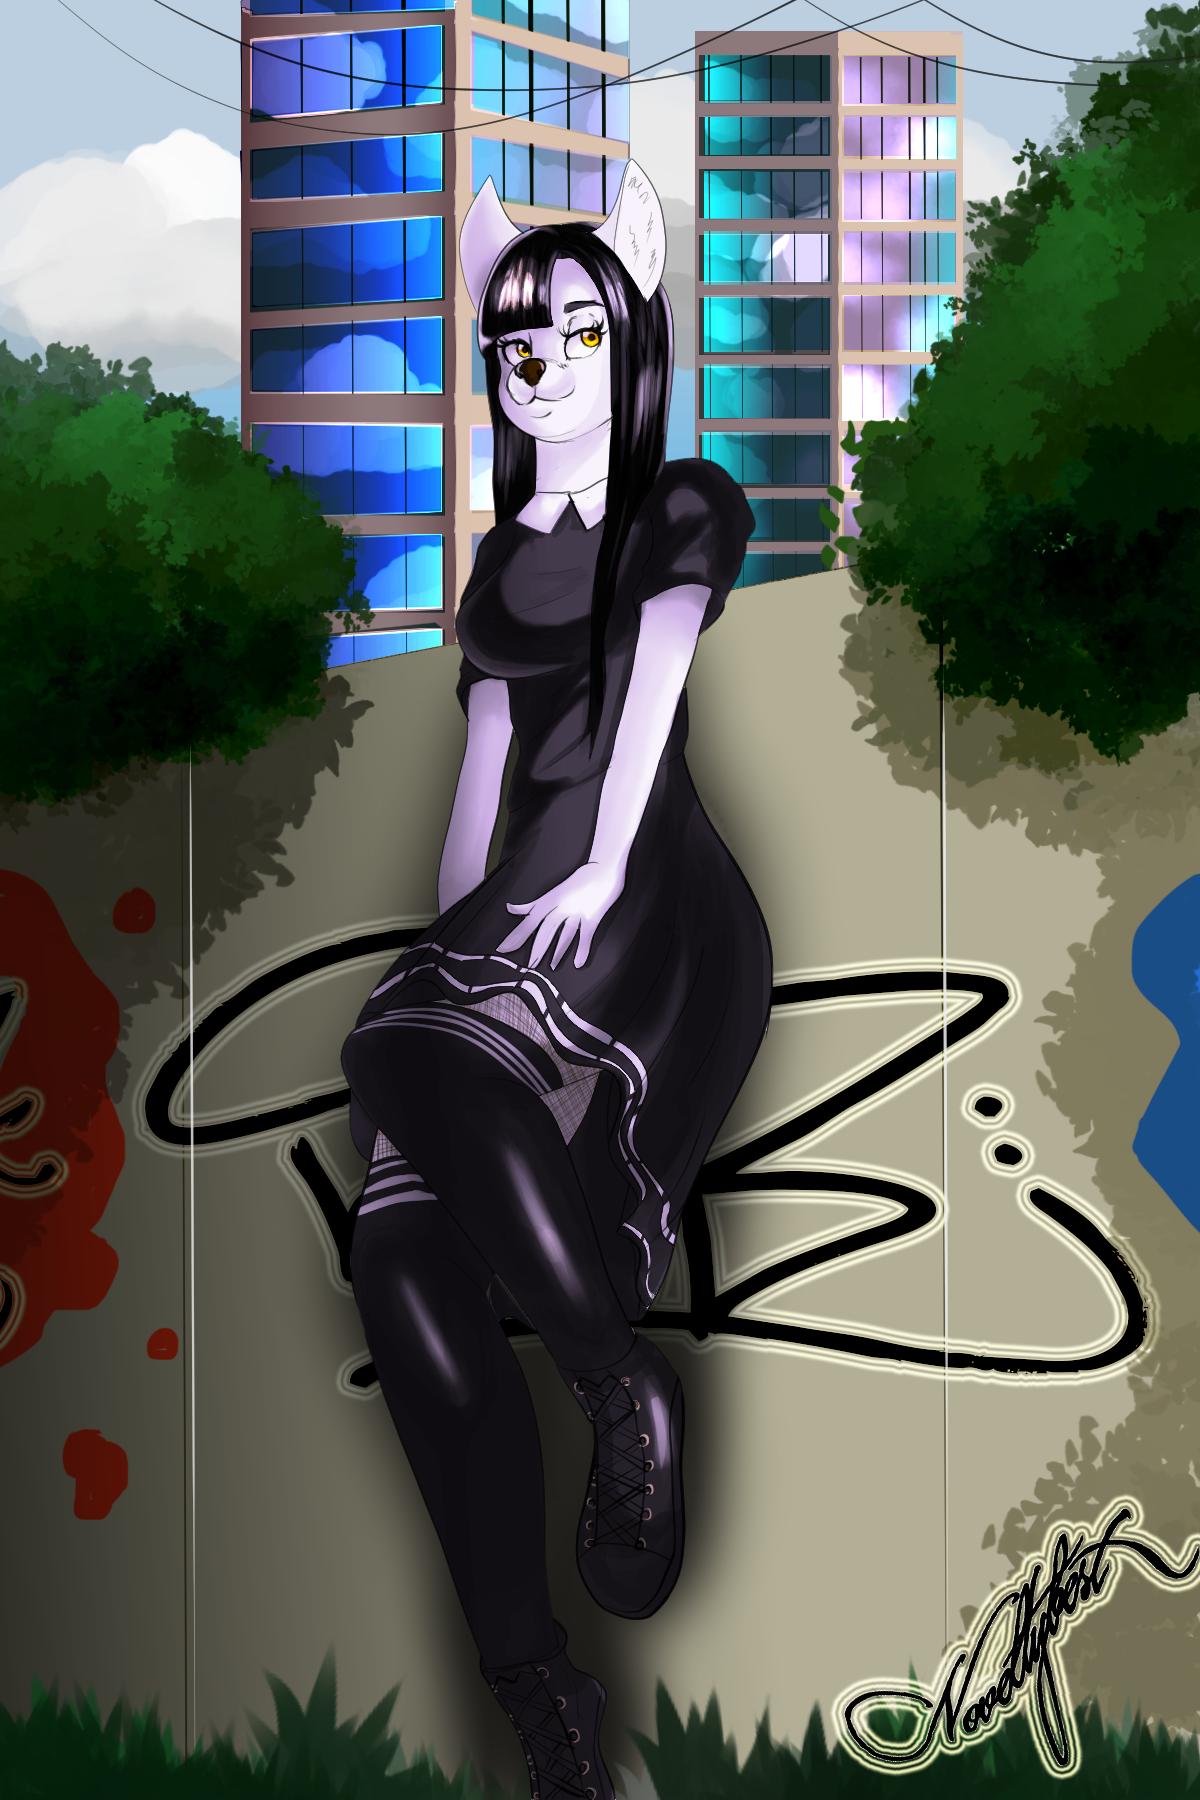 That black dress.